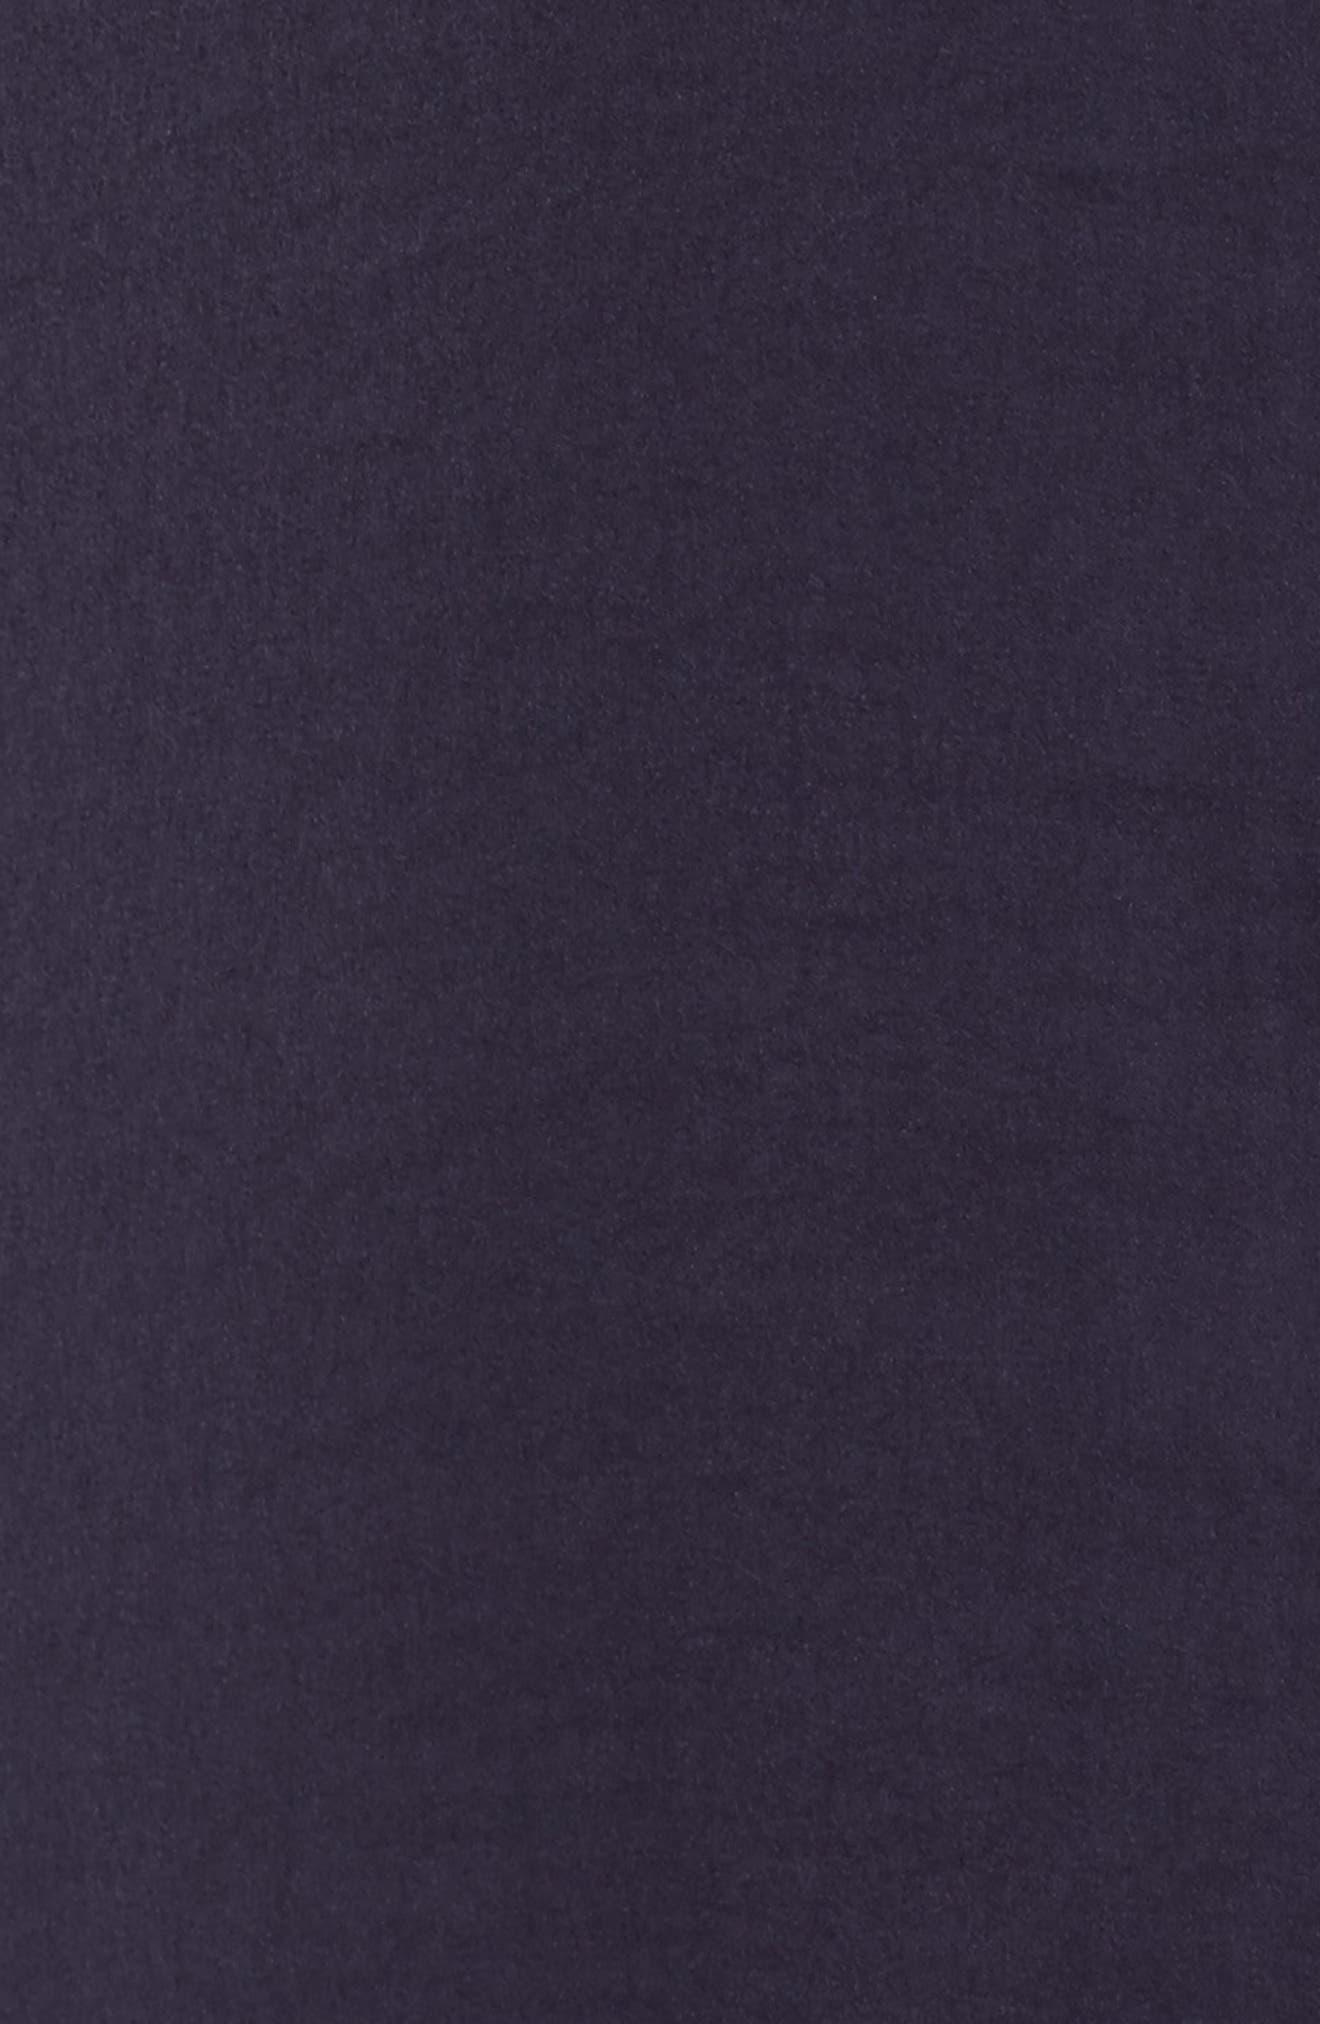 Satin Maxi Sleep Shirt,                             Alternate thumbnail 5, color,